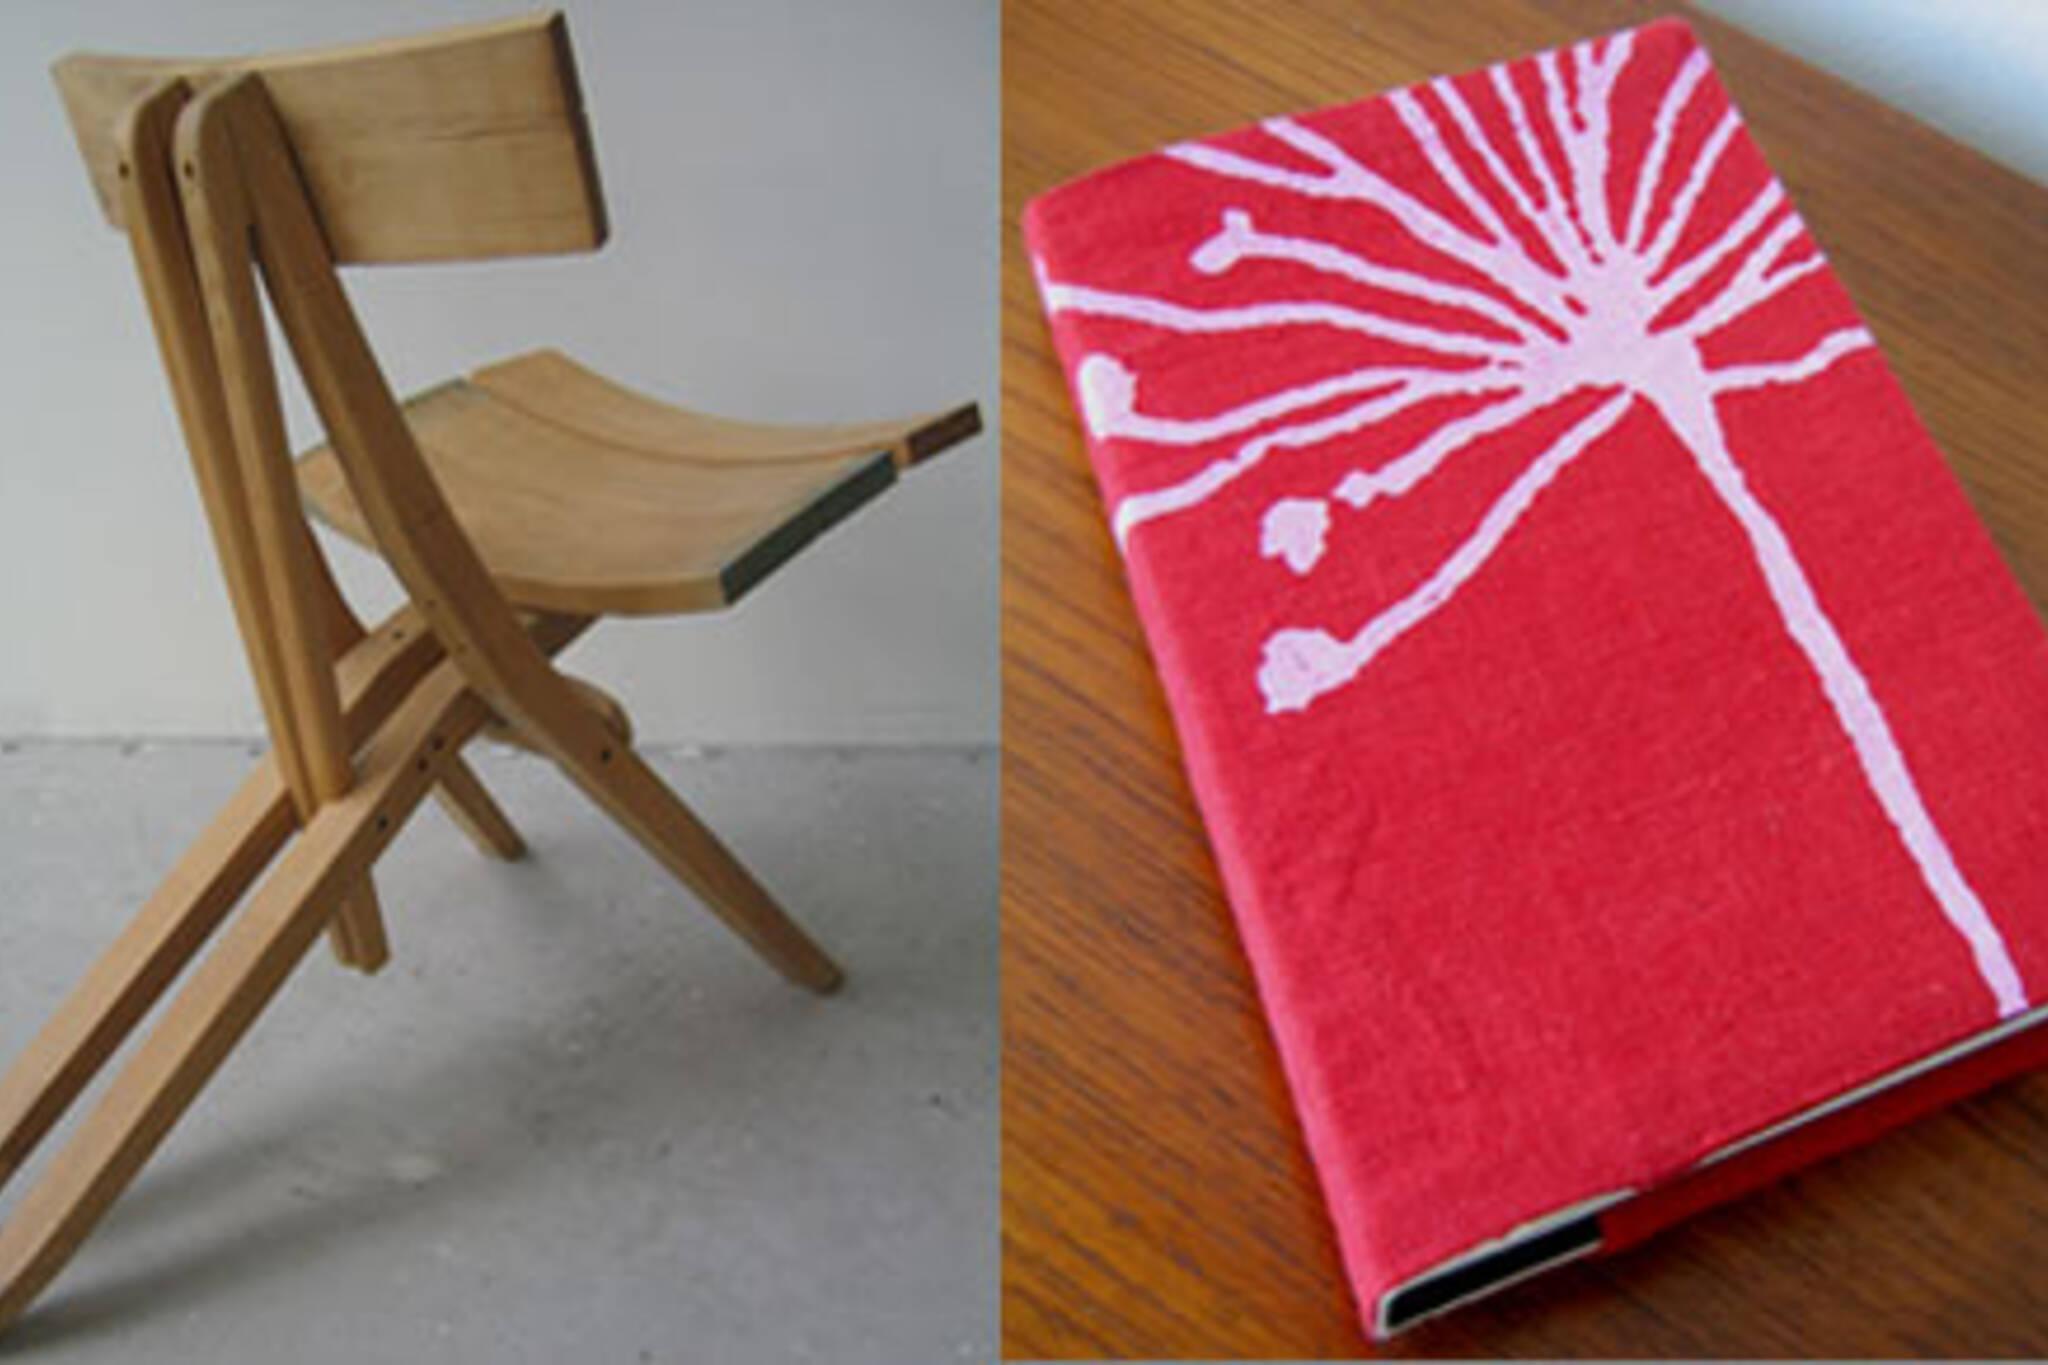 20070220_Bookhou-designs.jpg